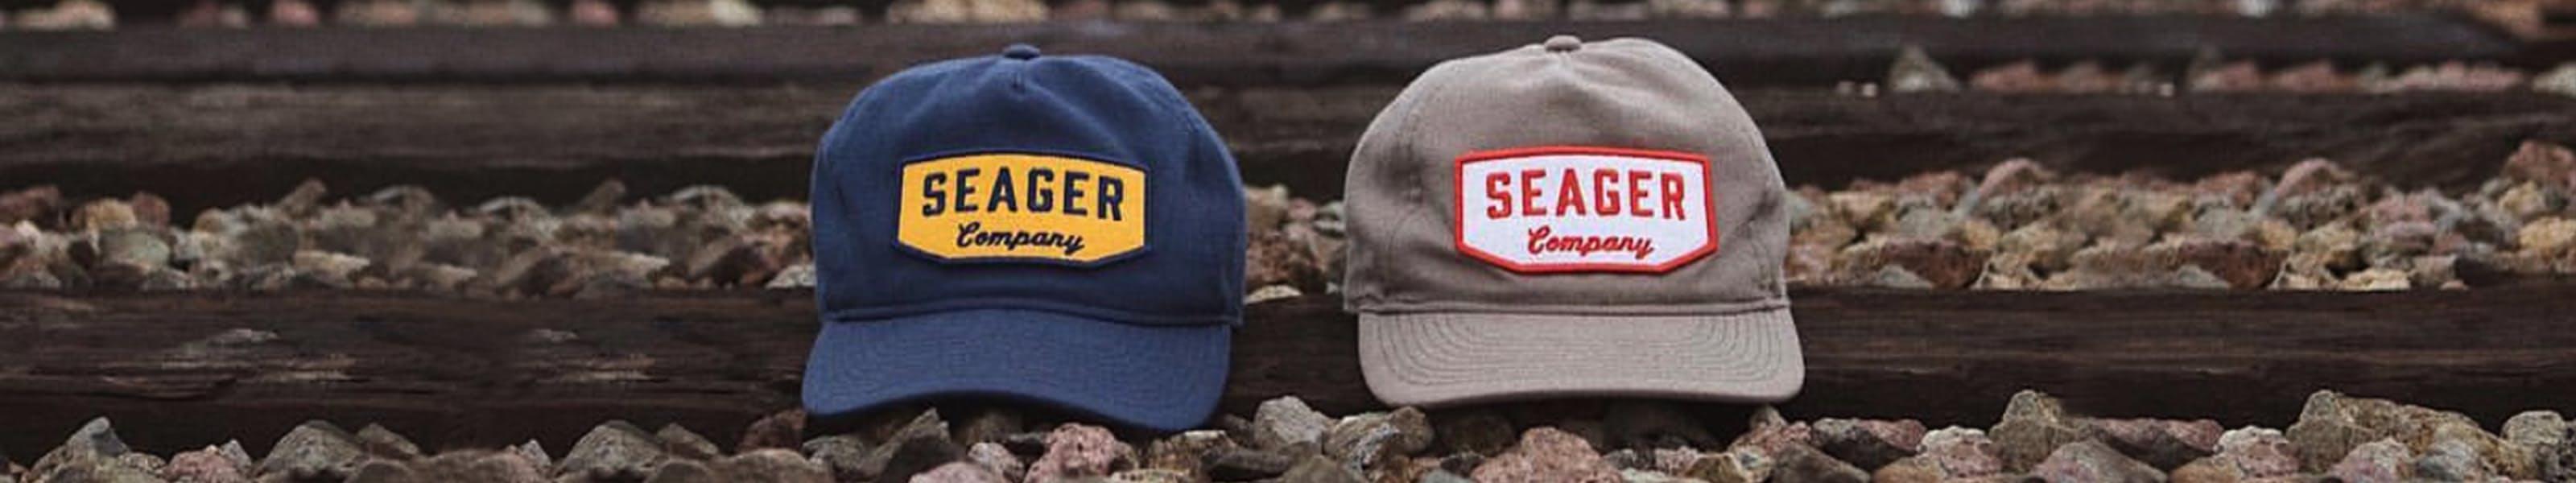 Header hats 01 1904.jpg?ixlib=rails 2.1